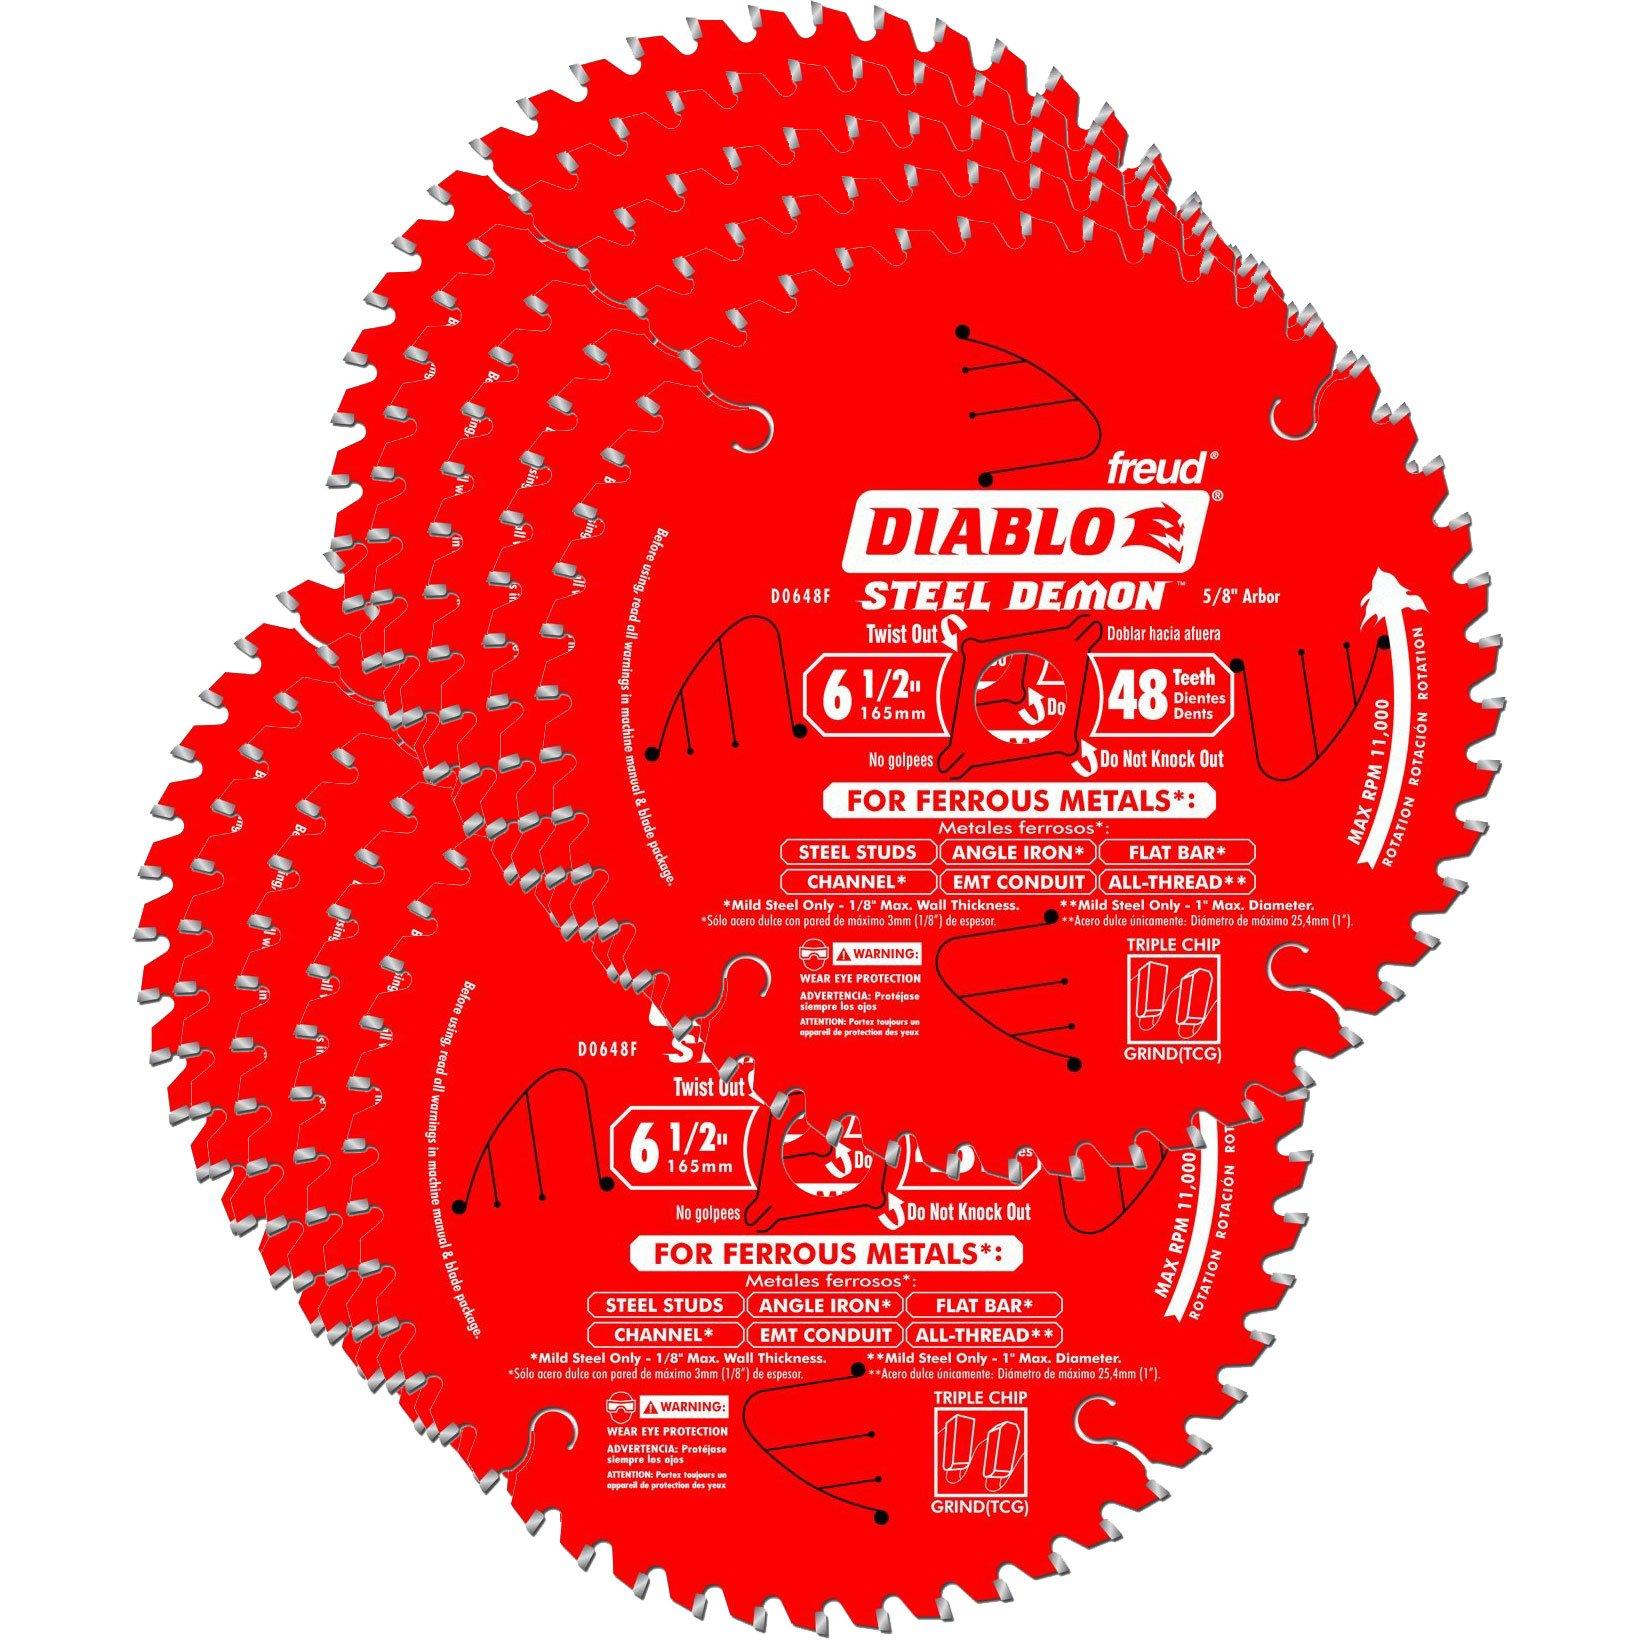 Hoja Sierra Diablo por Freud D0648 Ø165mm - 48 Dientes - eje 16mm para Metales [10un]